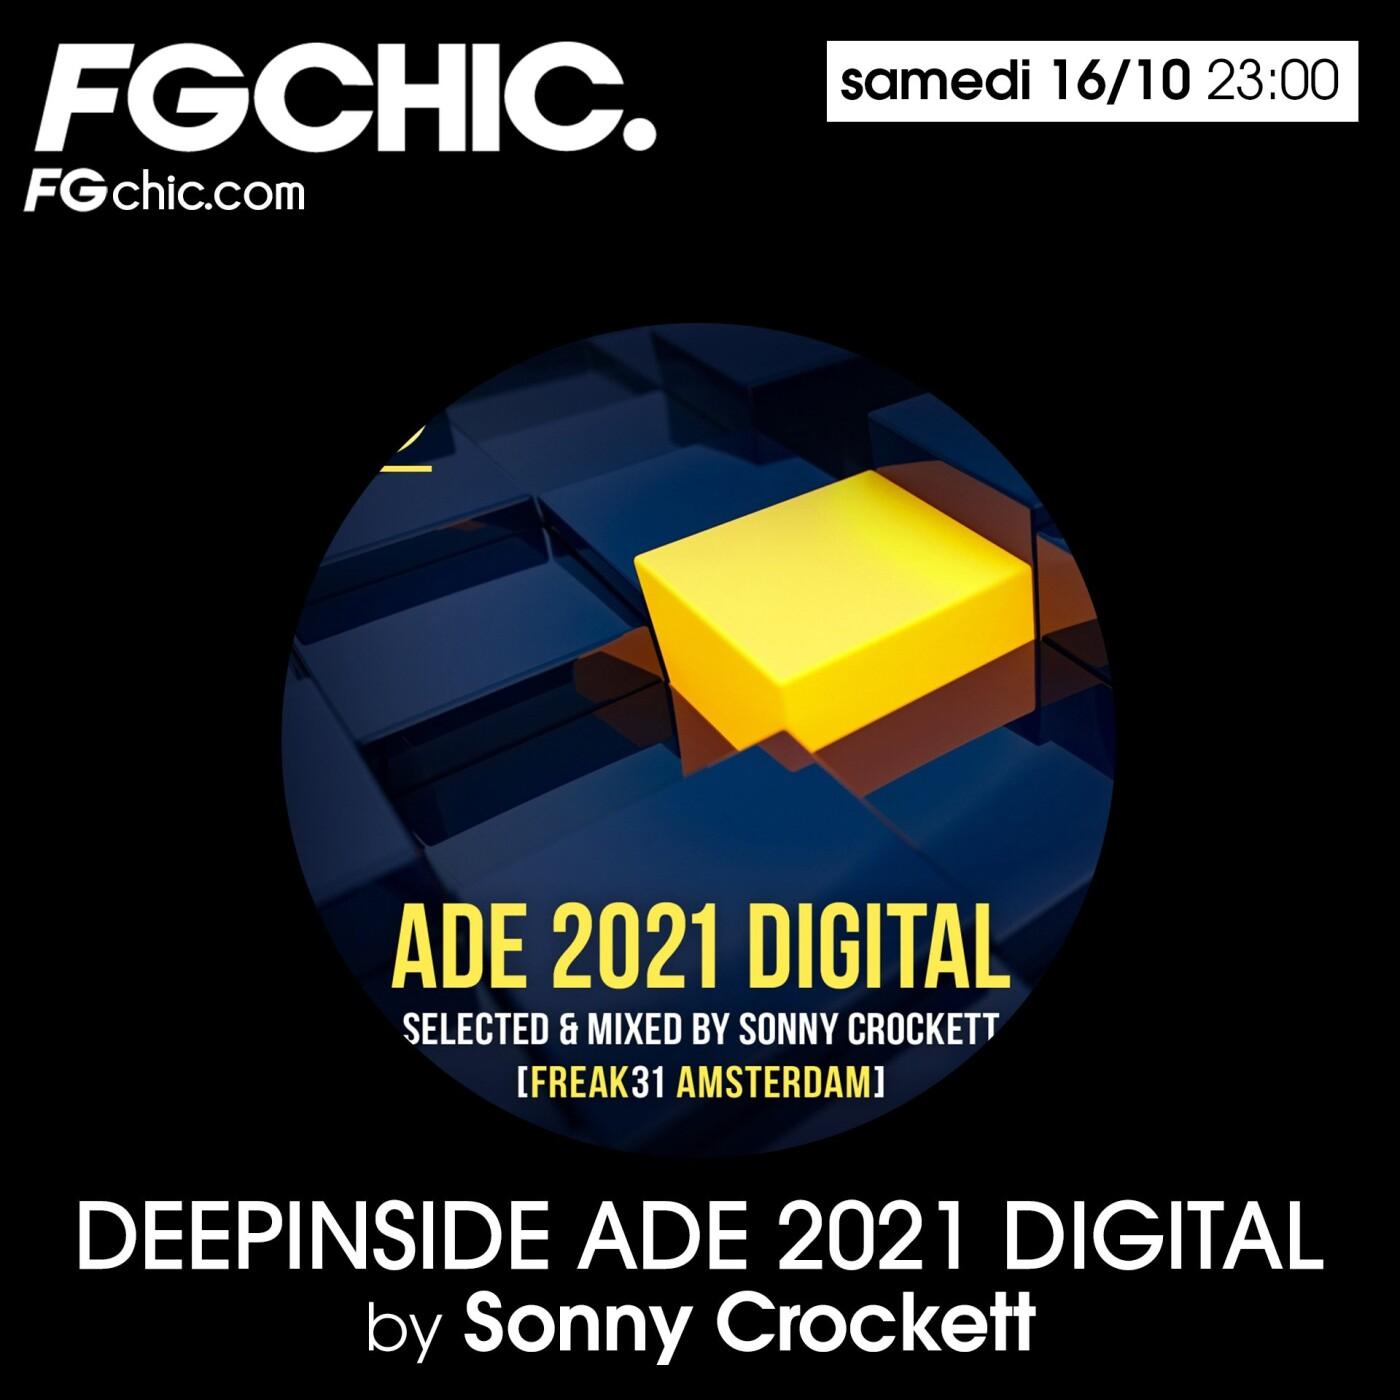 DEEPINSIDE ADE 2021 DIGITALE